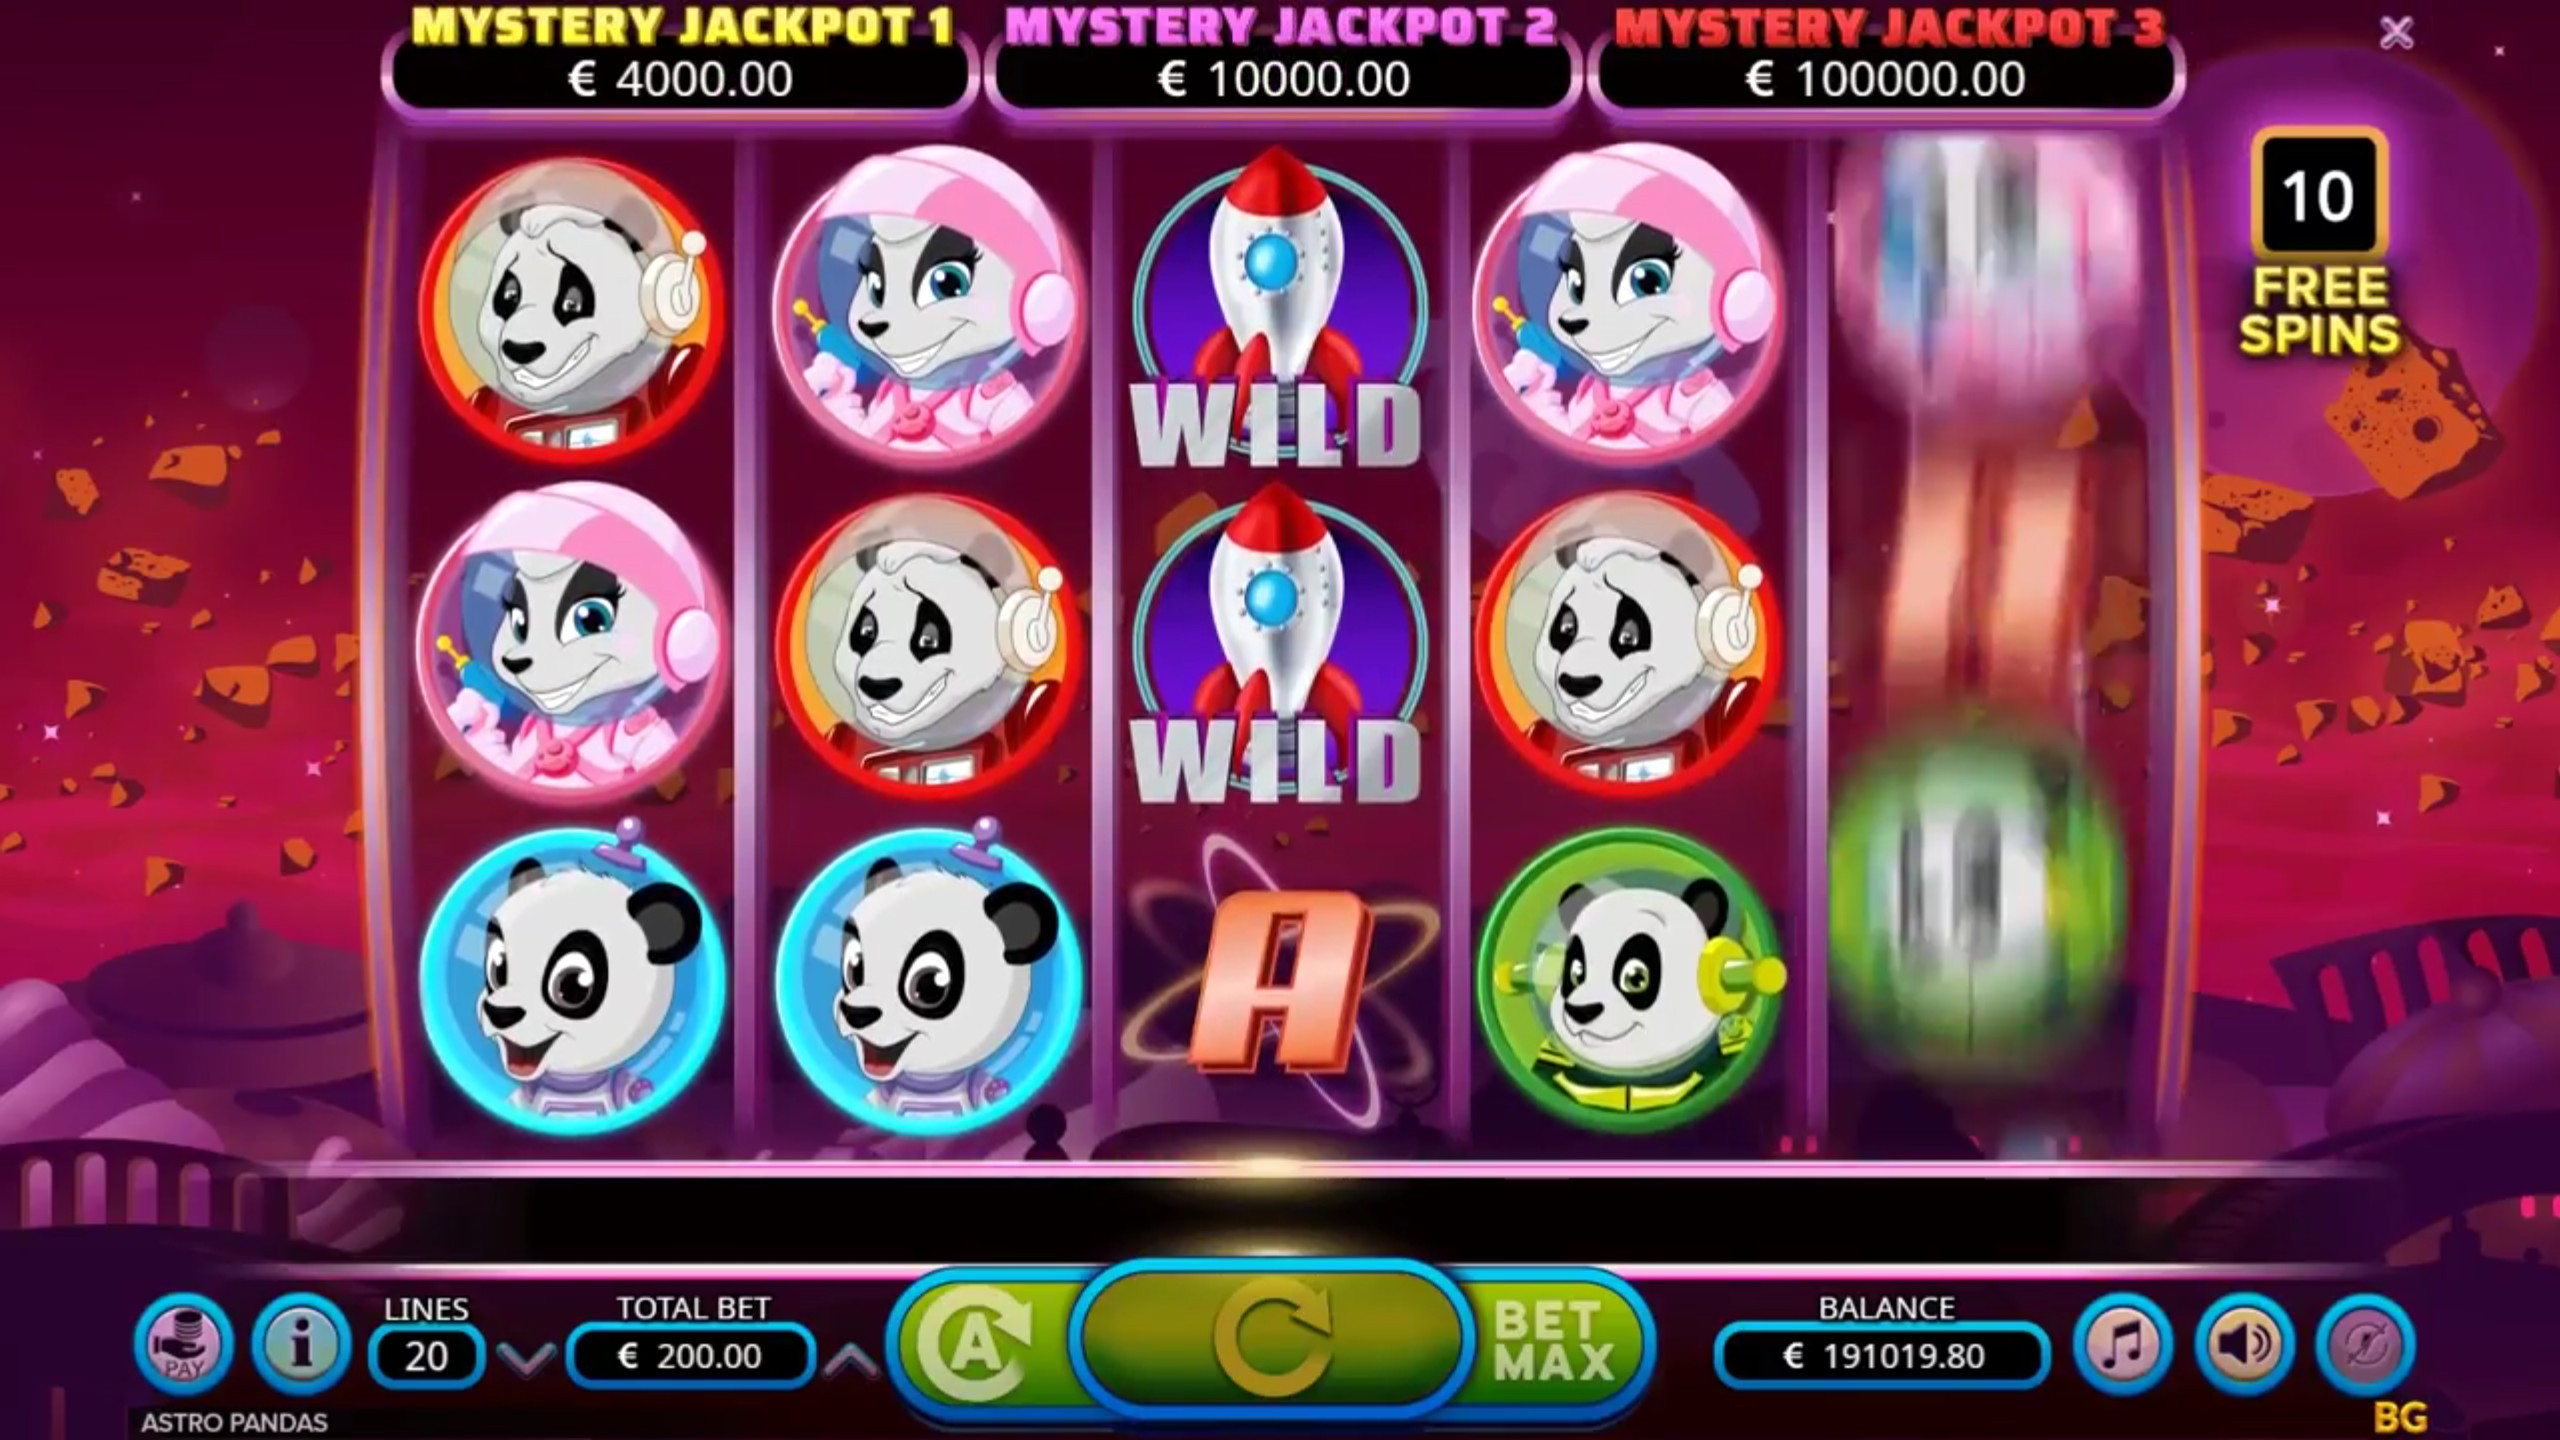 Astro Pandas Slot Machine